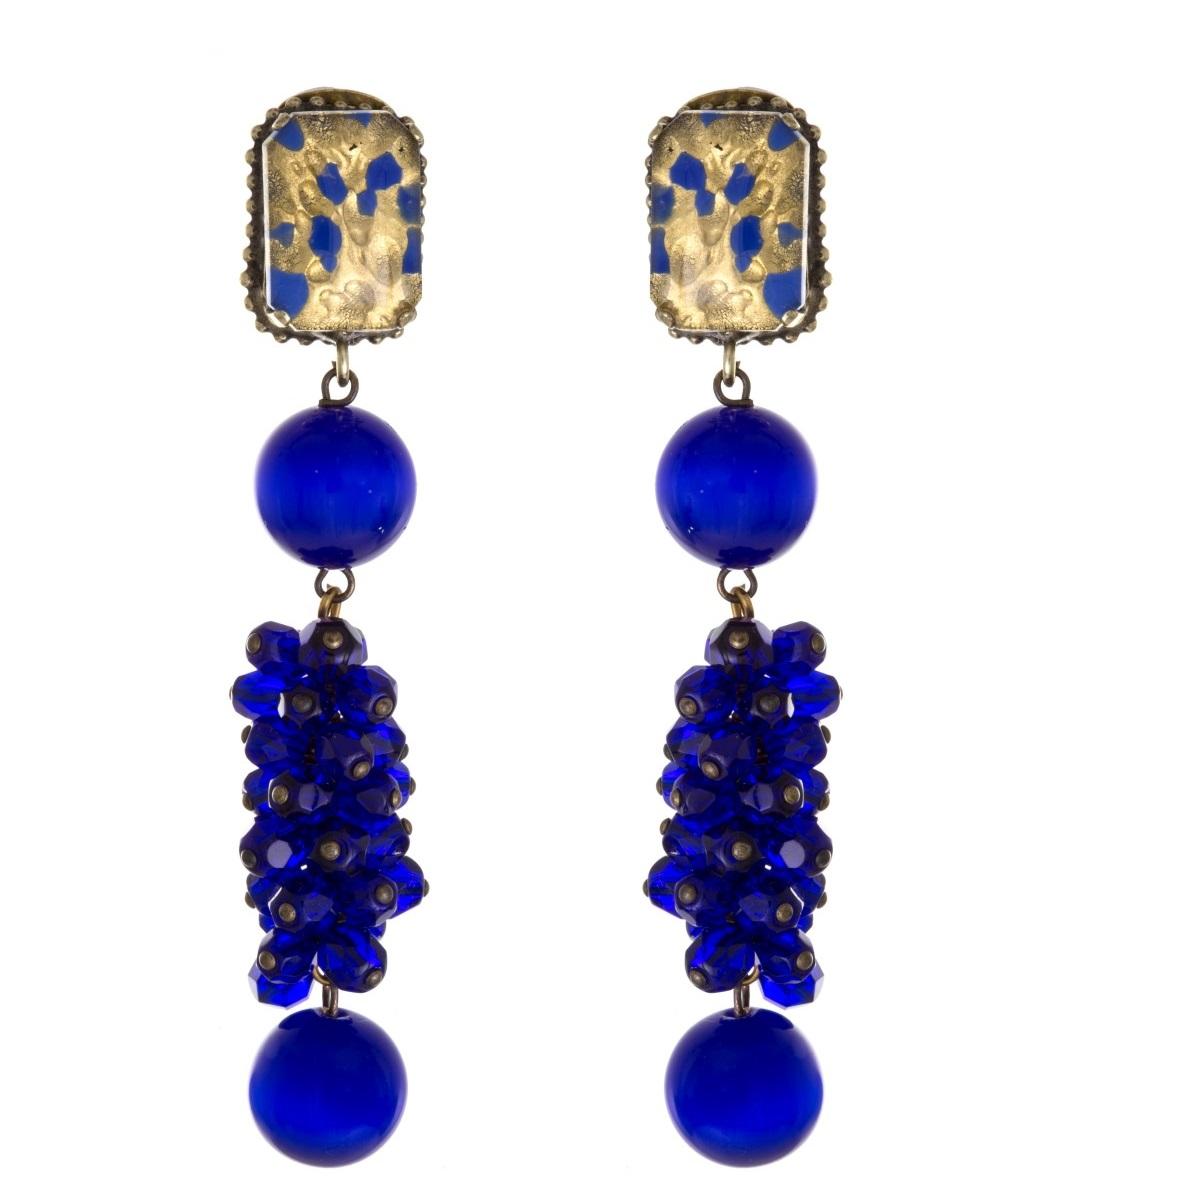 ARTWEAR DIMITRIADIS - Γυναικεία κρεμαστά σκουλαρίκια ARTWEAR DIMITRIADIS με μπλε γυναικεία αξεσουάρ κοσμήματα σκουλαρίκια